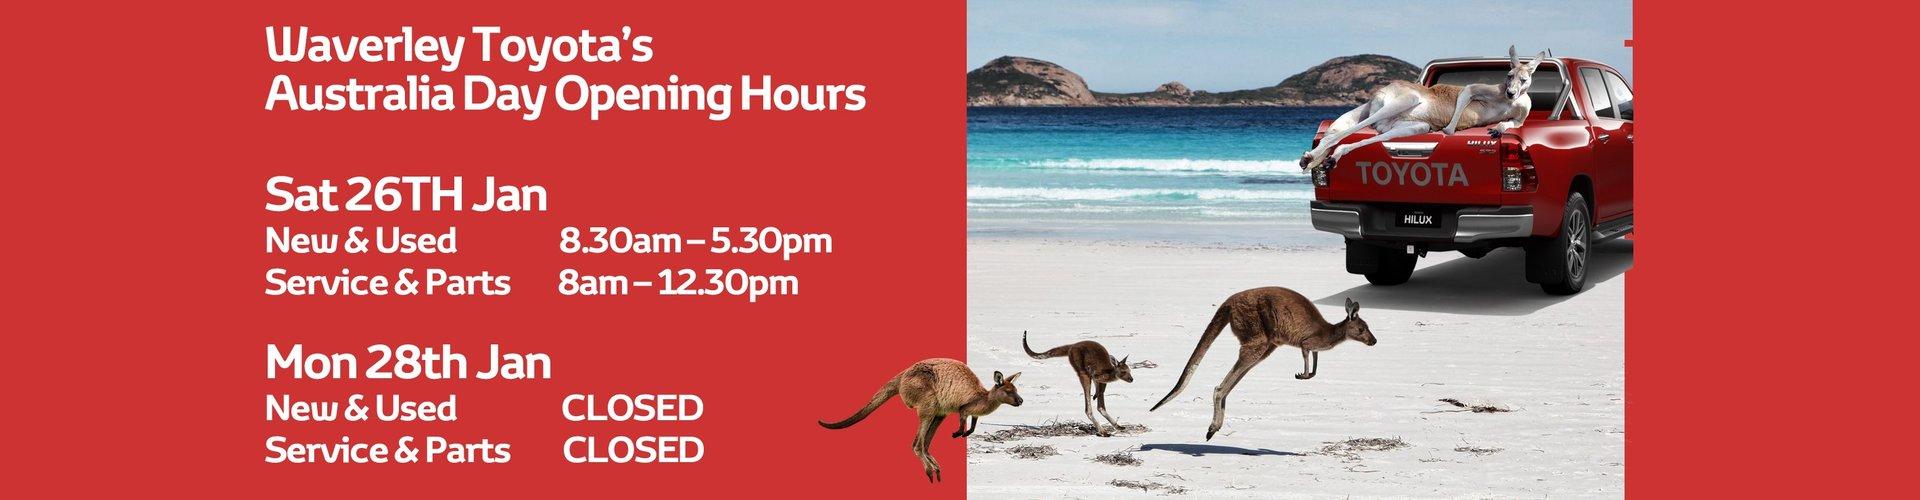 Waverley Toyota Australia Day Opening Hours